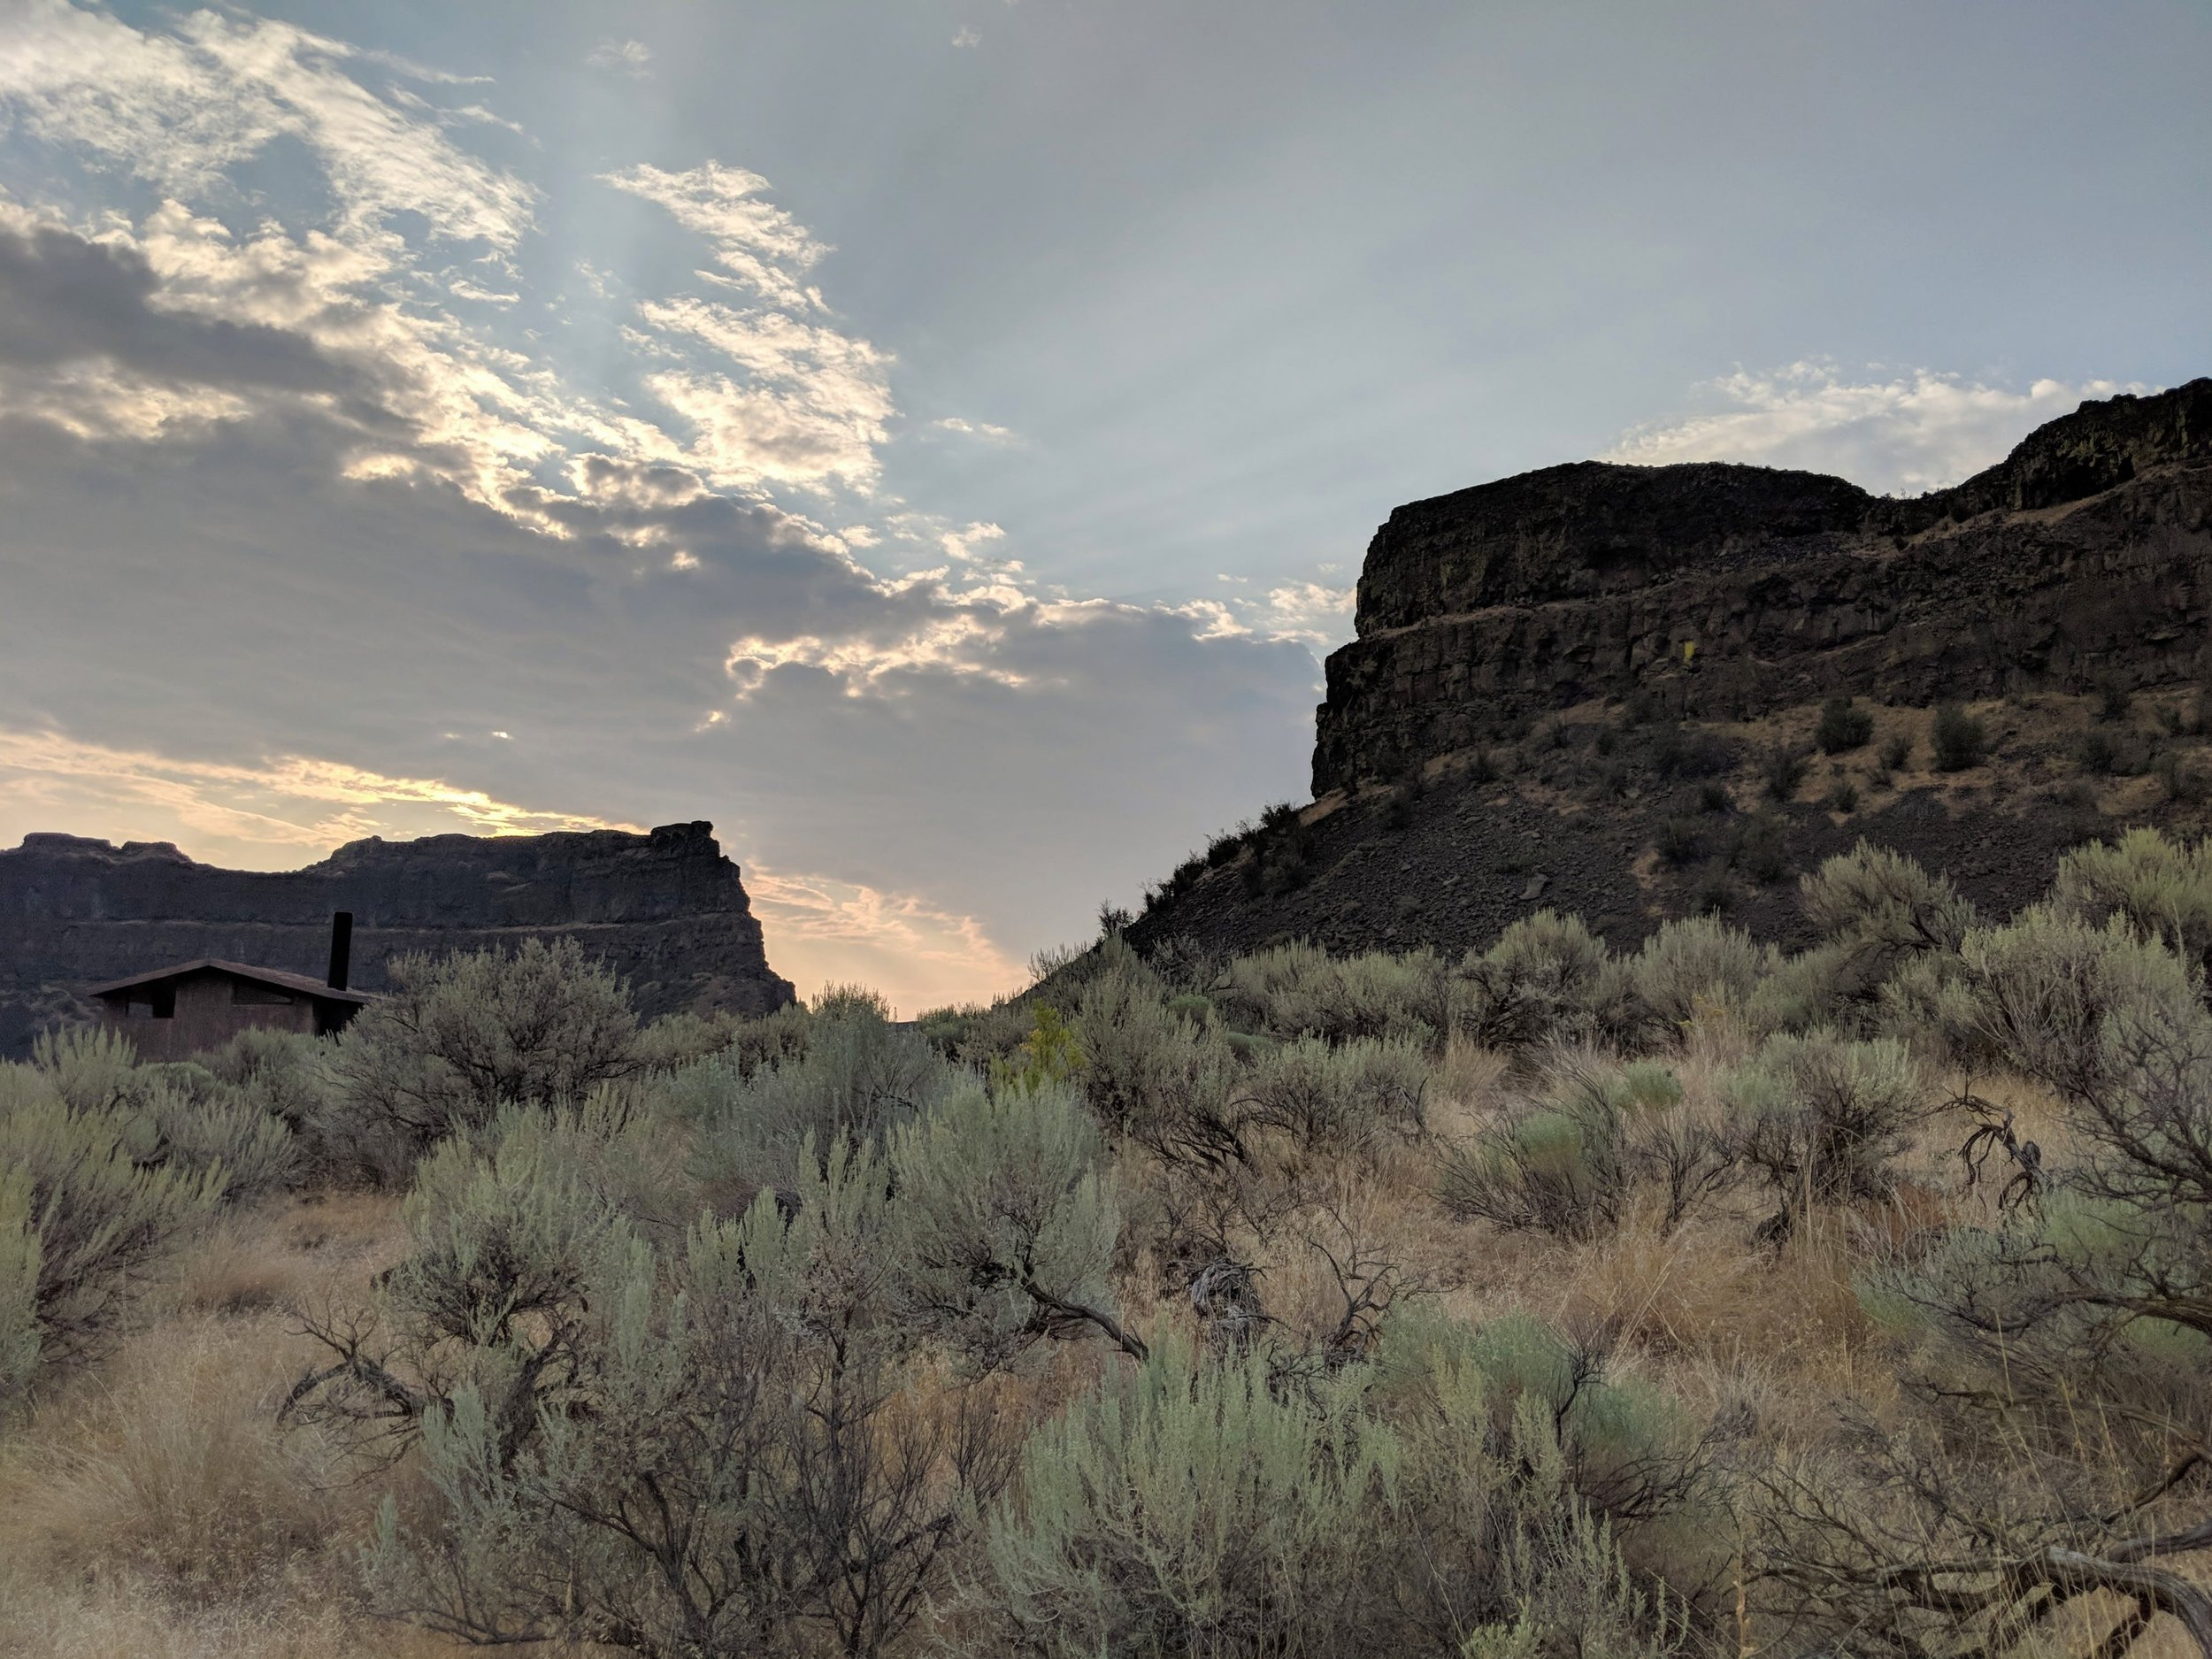 Looking back at Dry Falls